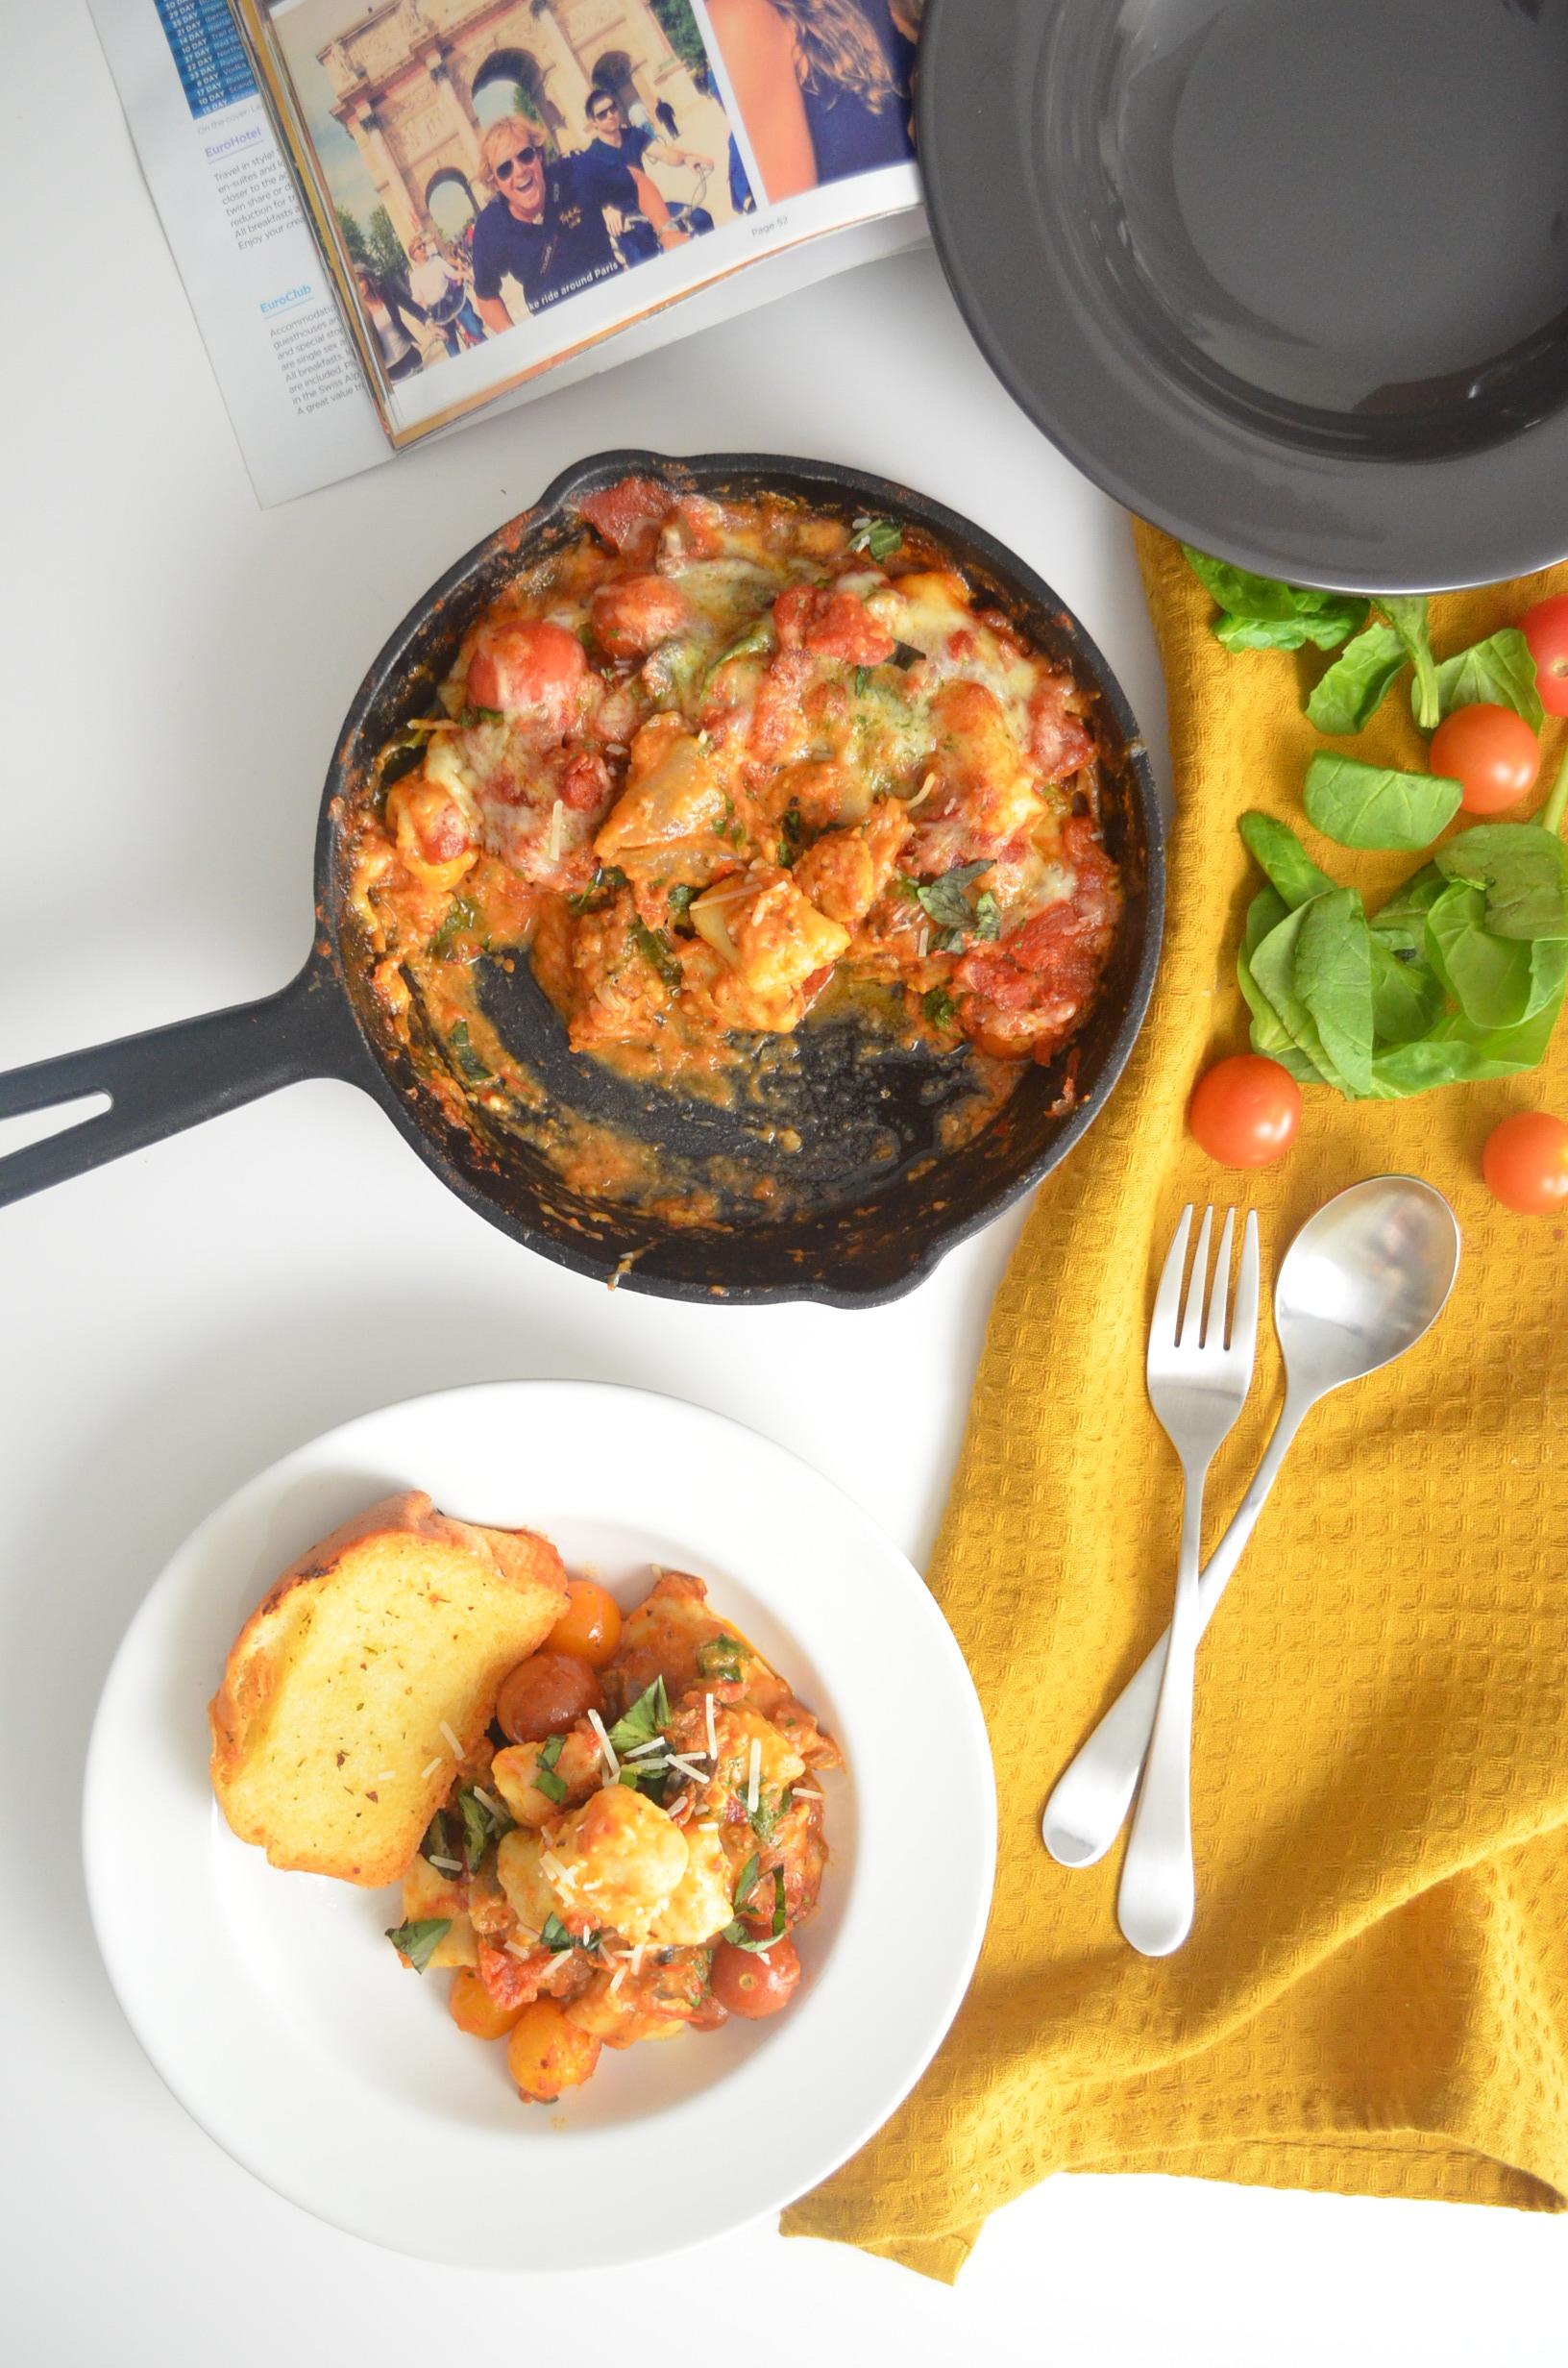 Bakeed Homemade Potato Gnocchi in Tomato Sauce